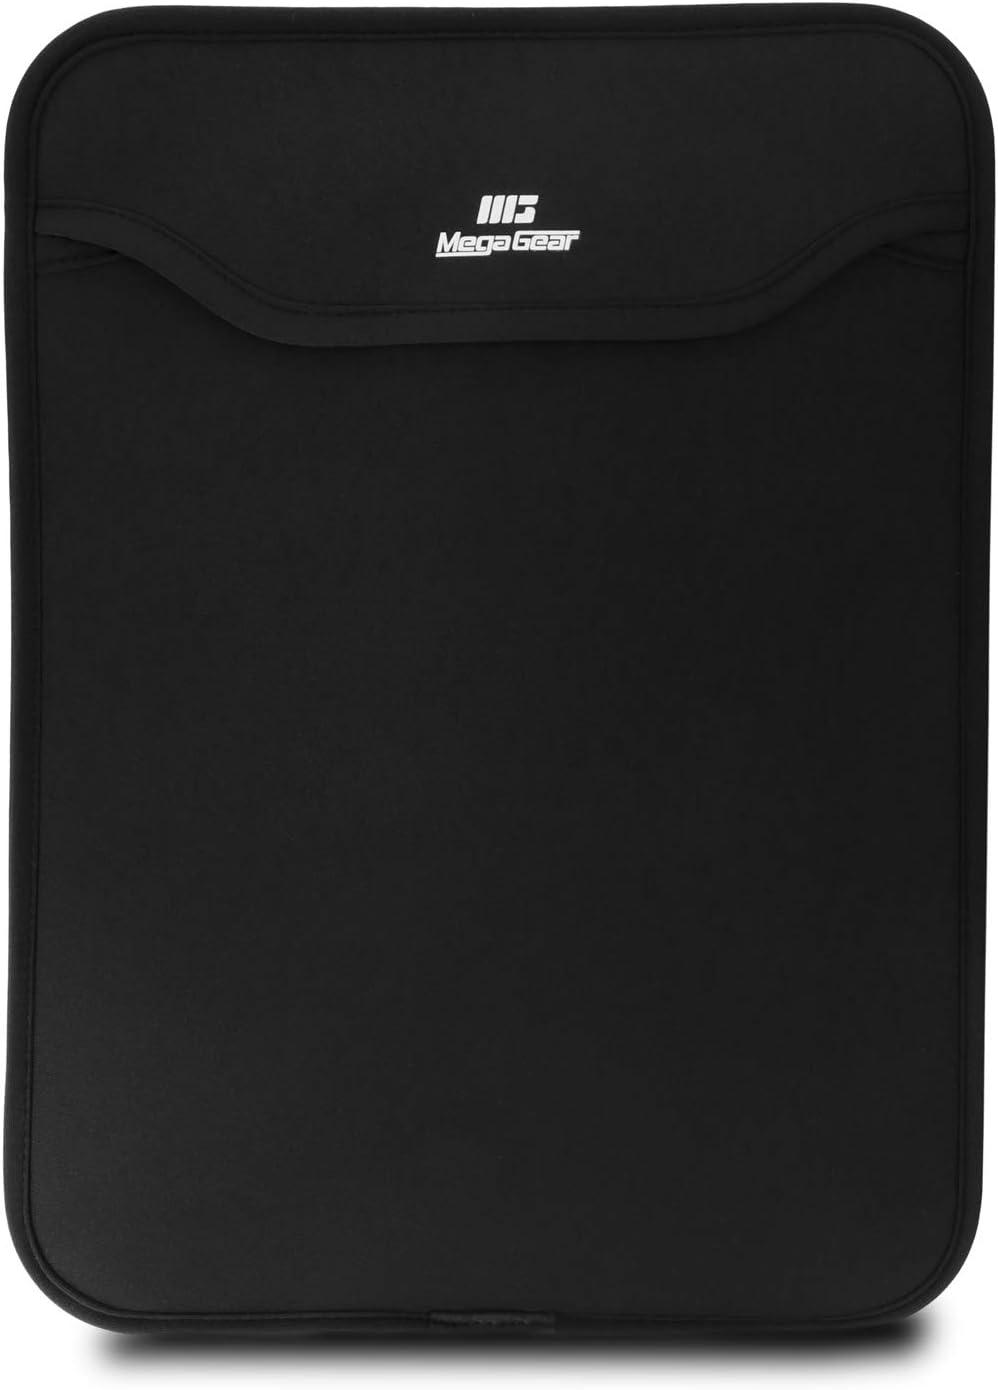 MegaGear Ultra Light Neoprene Laptop Sleeve Case Compatible with 15 & 16 inch MacBook Pro